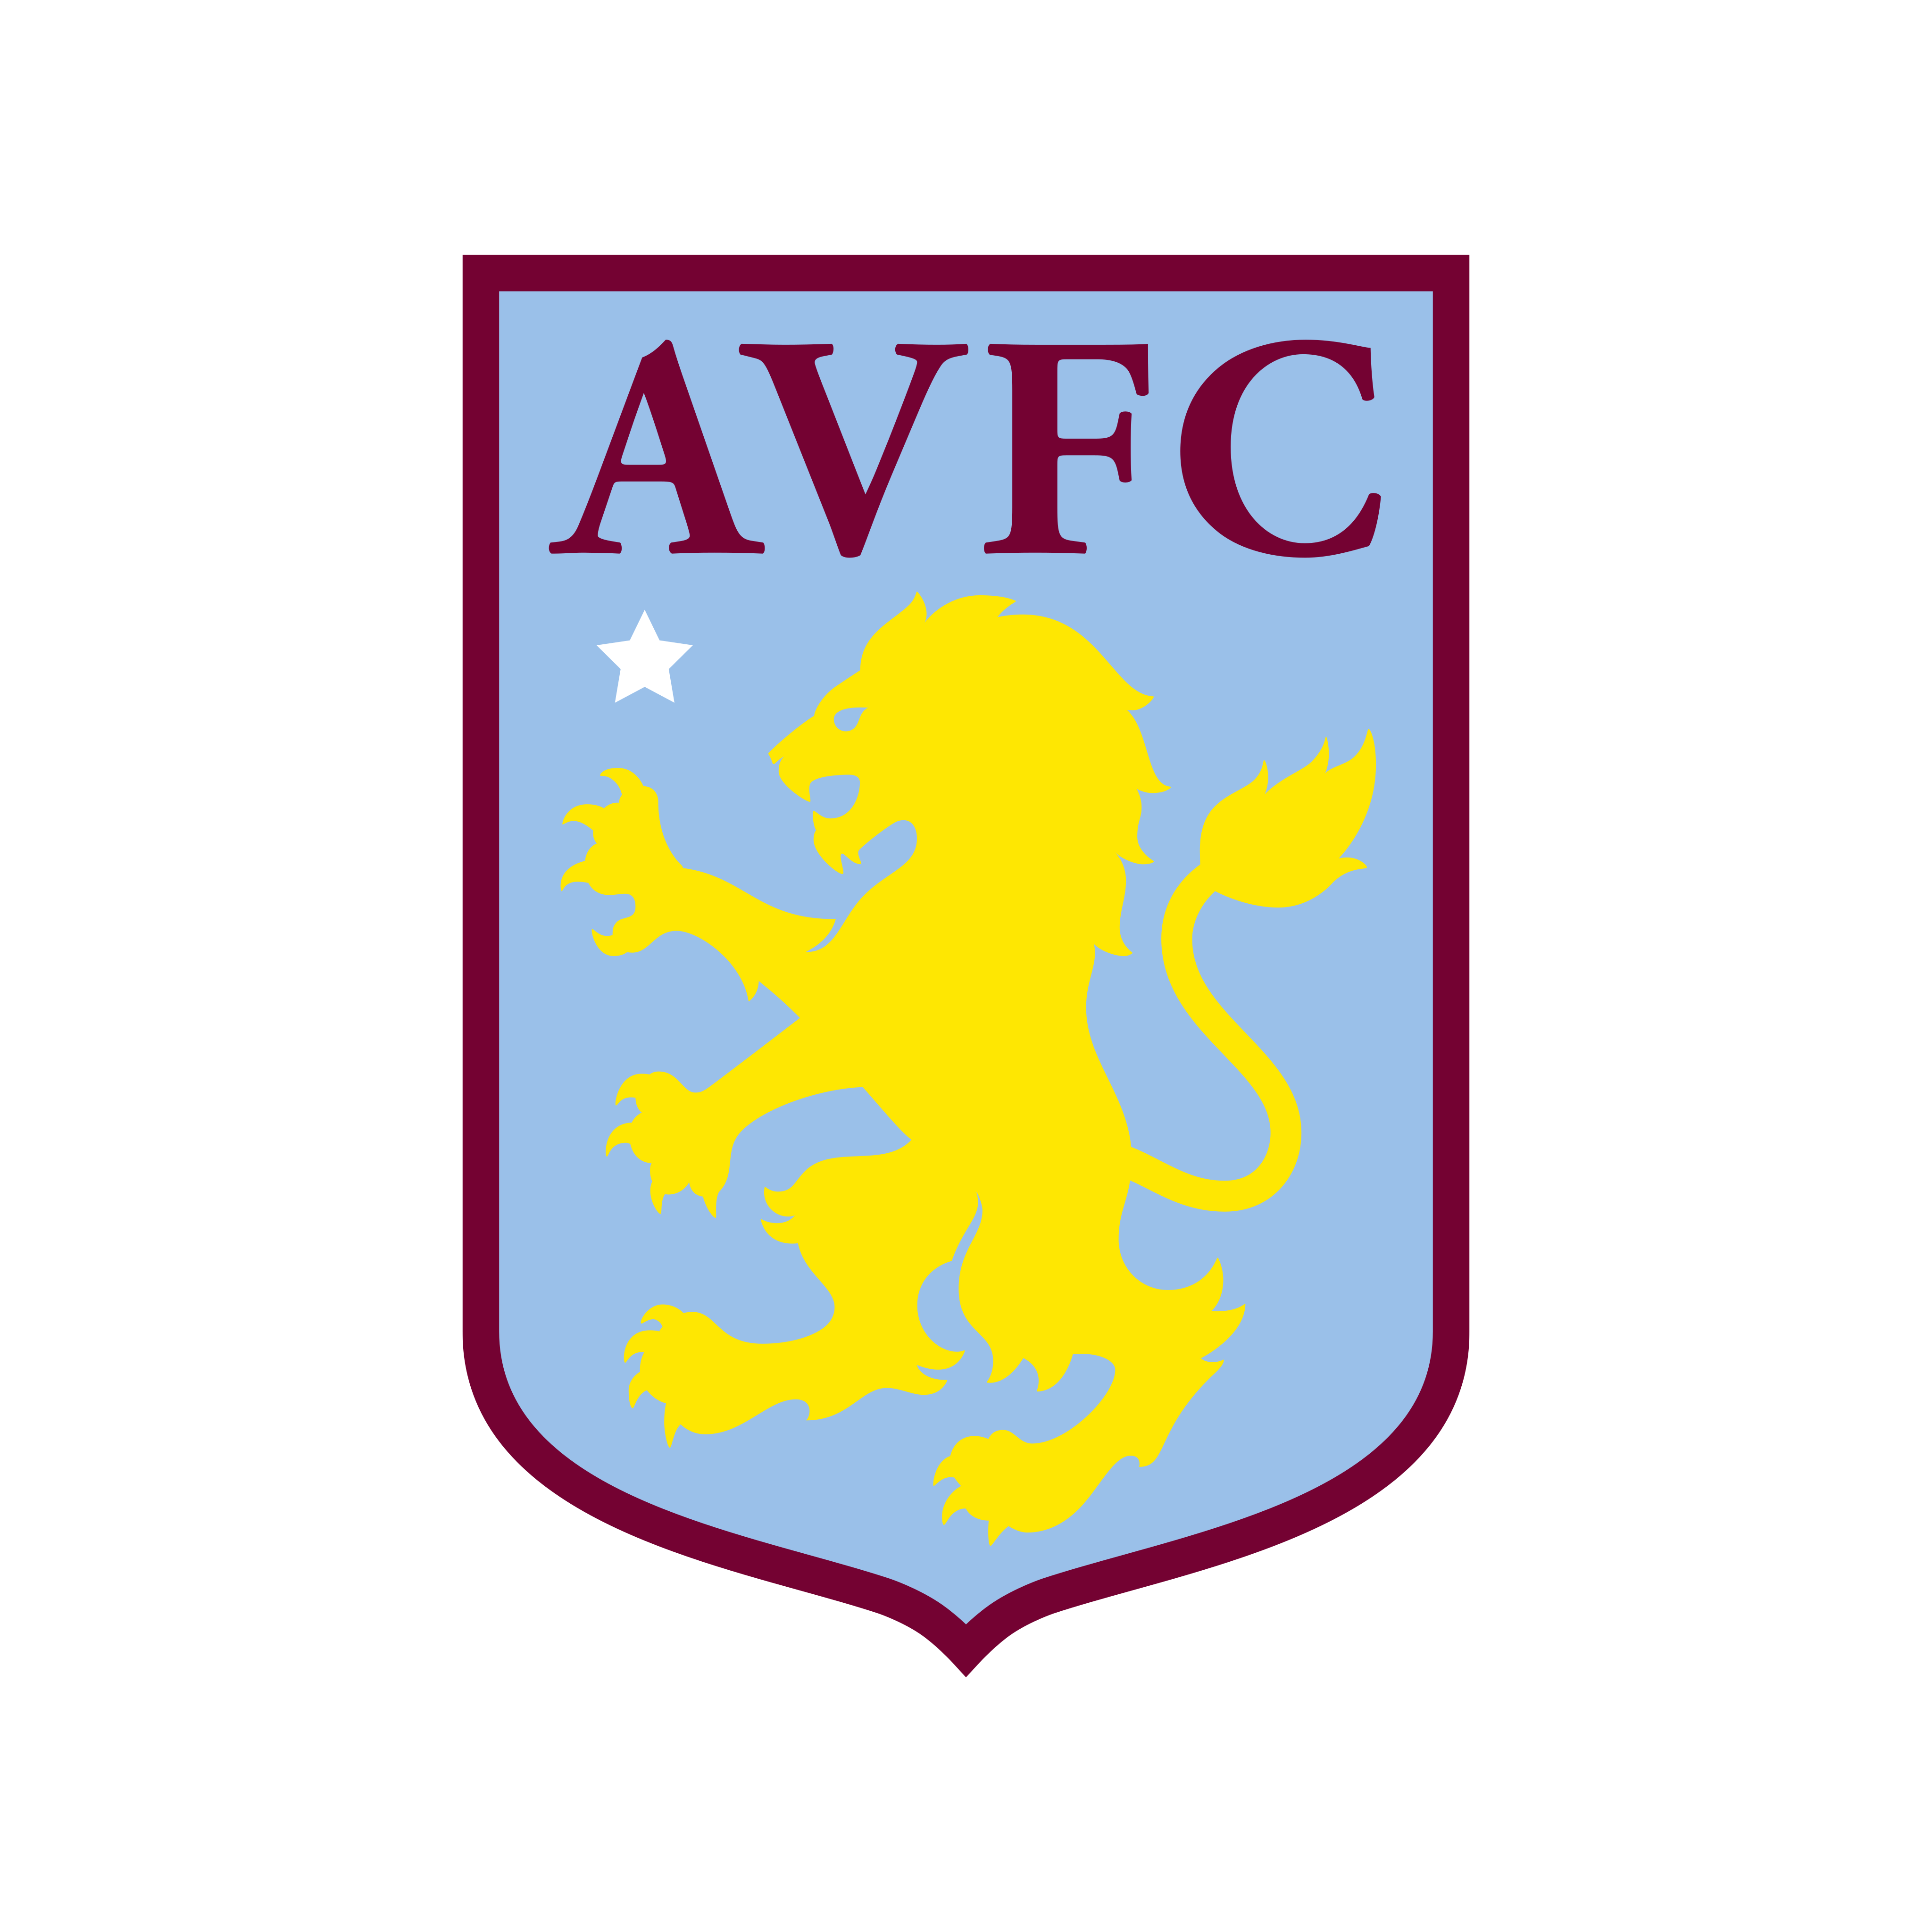 aston villa logo 0 - Aston Villa FC Logo